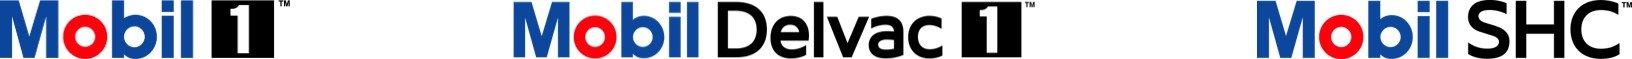 Mobil 1 logo balk